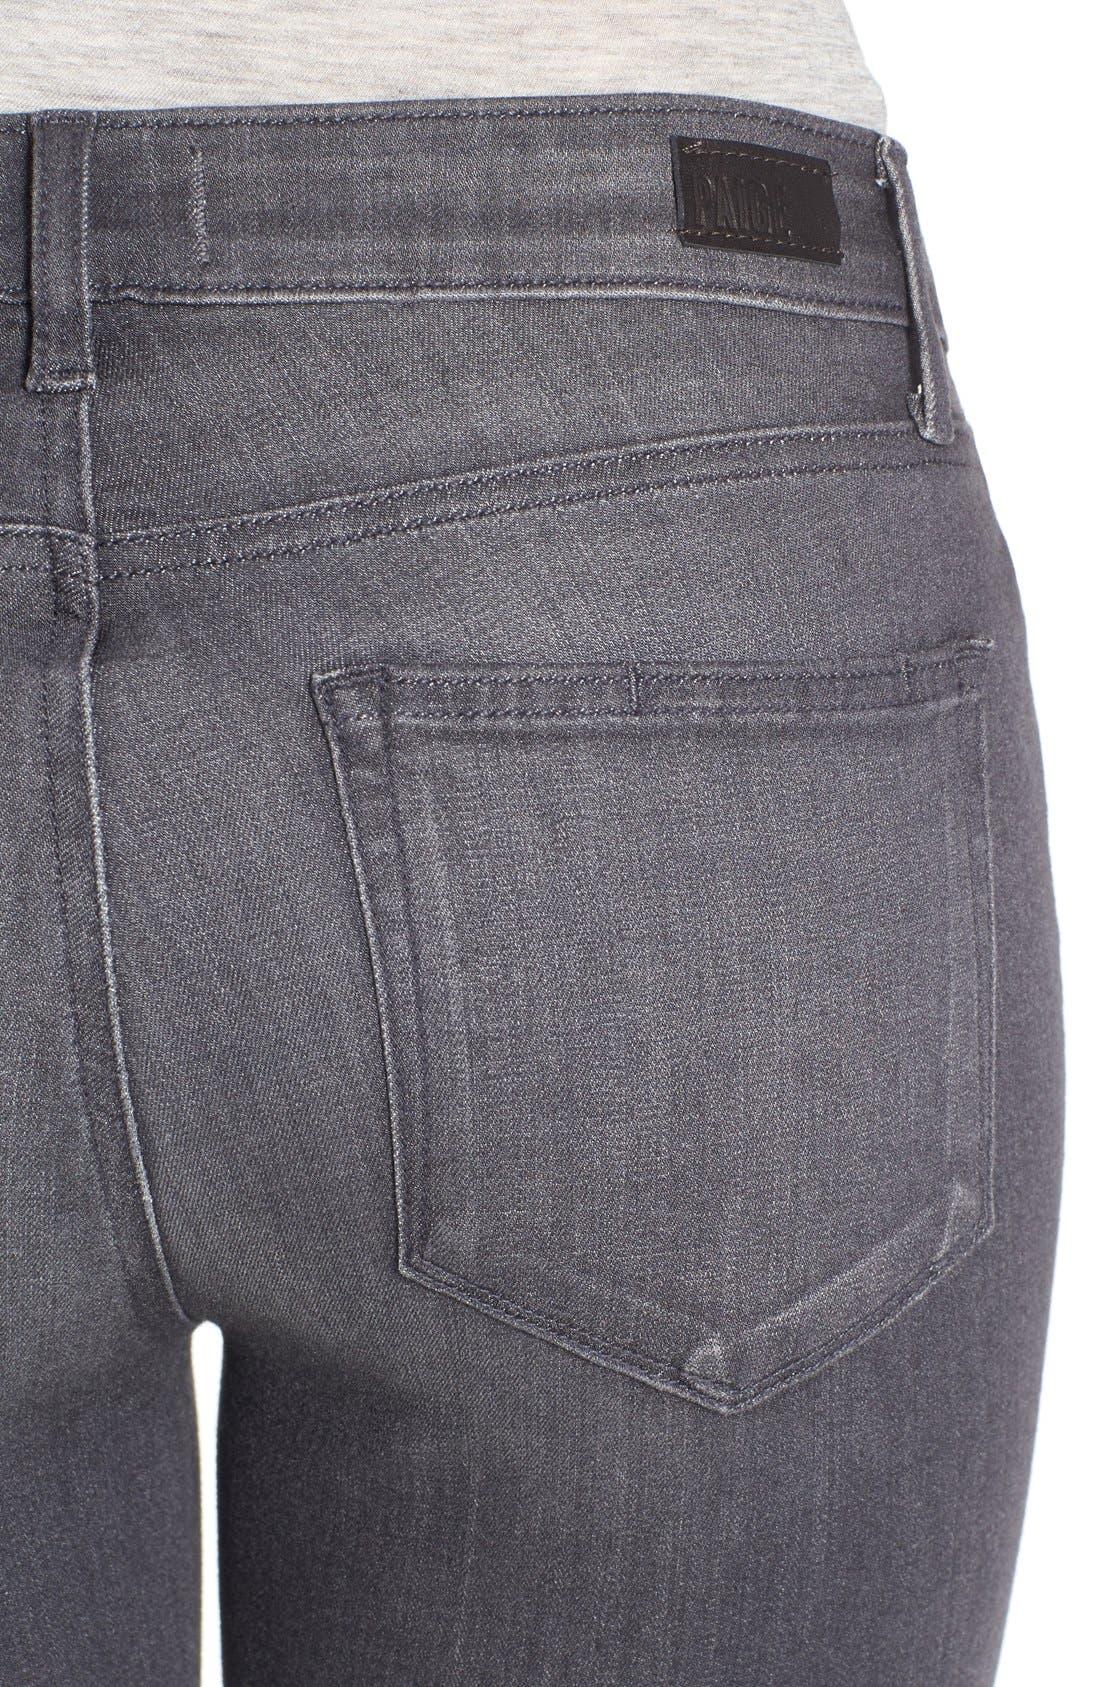 Alternate Image 4  - PAIGE Transcend - Verdugo Ankle Jeans (Bonnie Grey) (Nordstrom Exclusive)